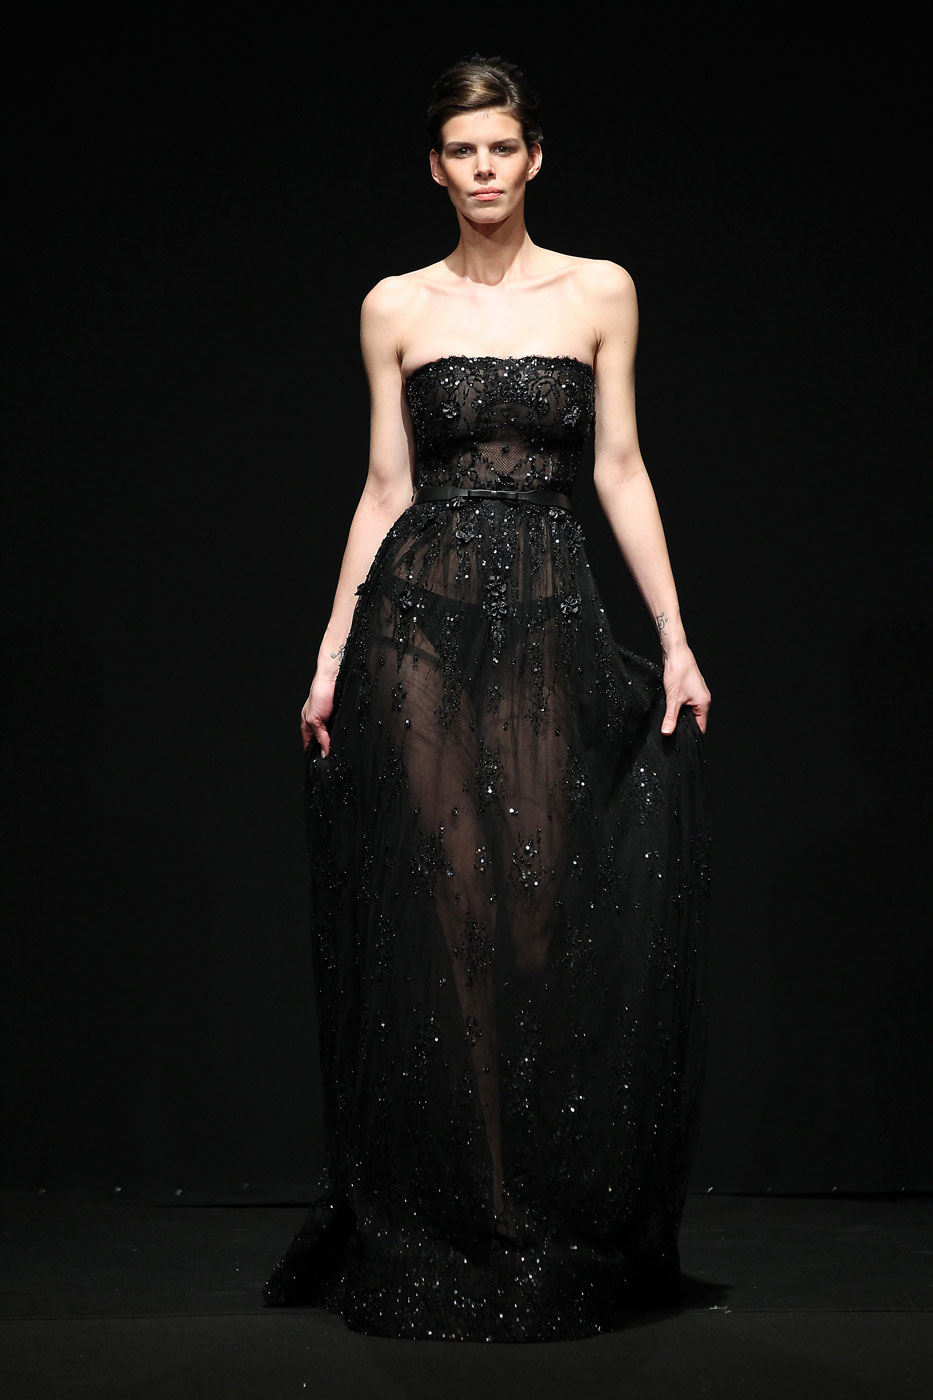 Abed-Mahfouz-fashion-runway-show-haute-couture-paris-spring-2015-the-impression-36